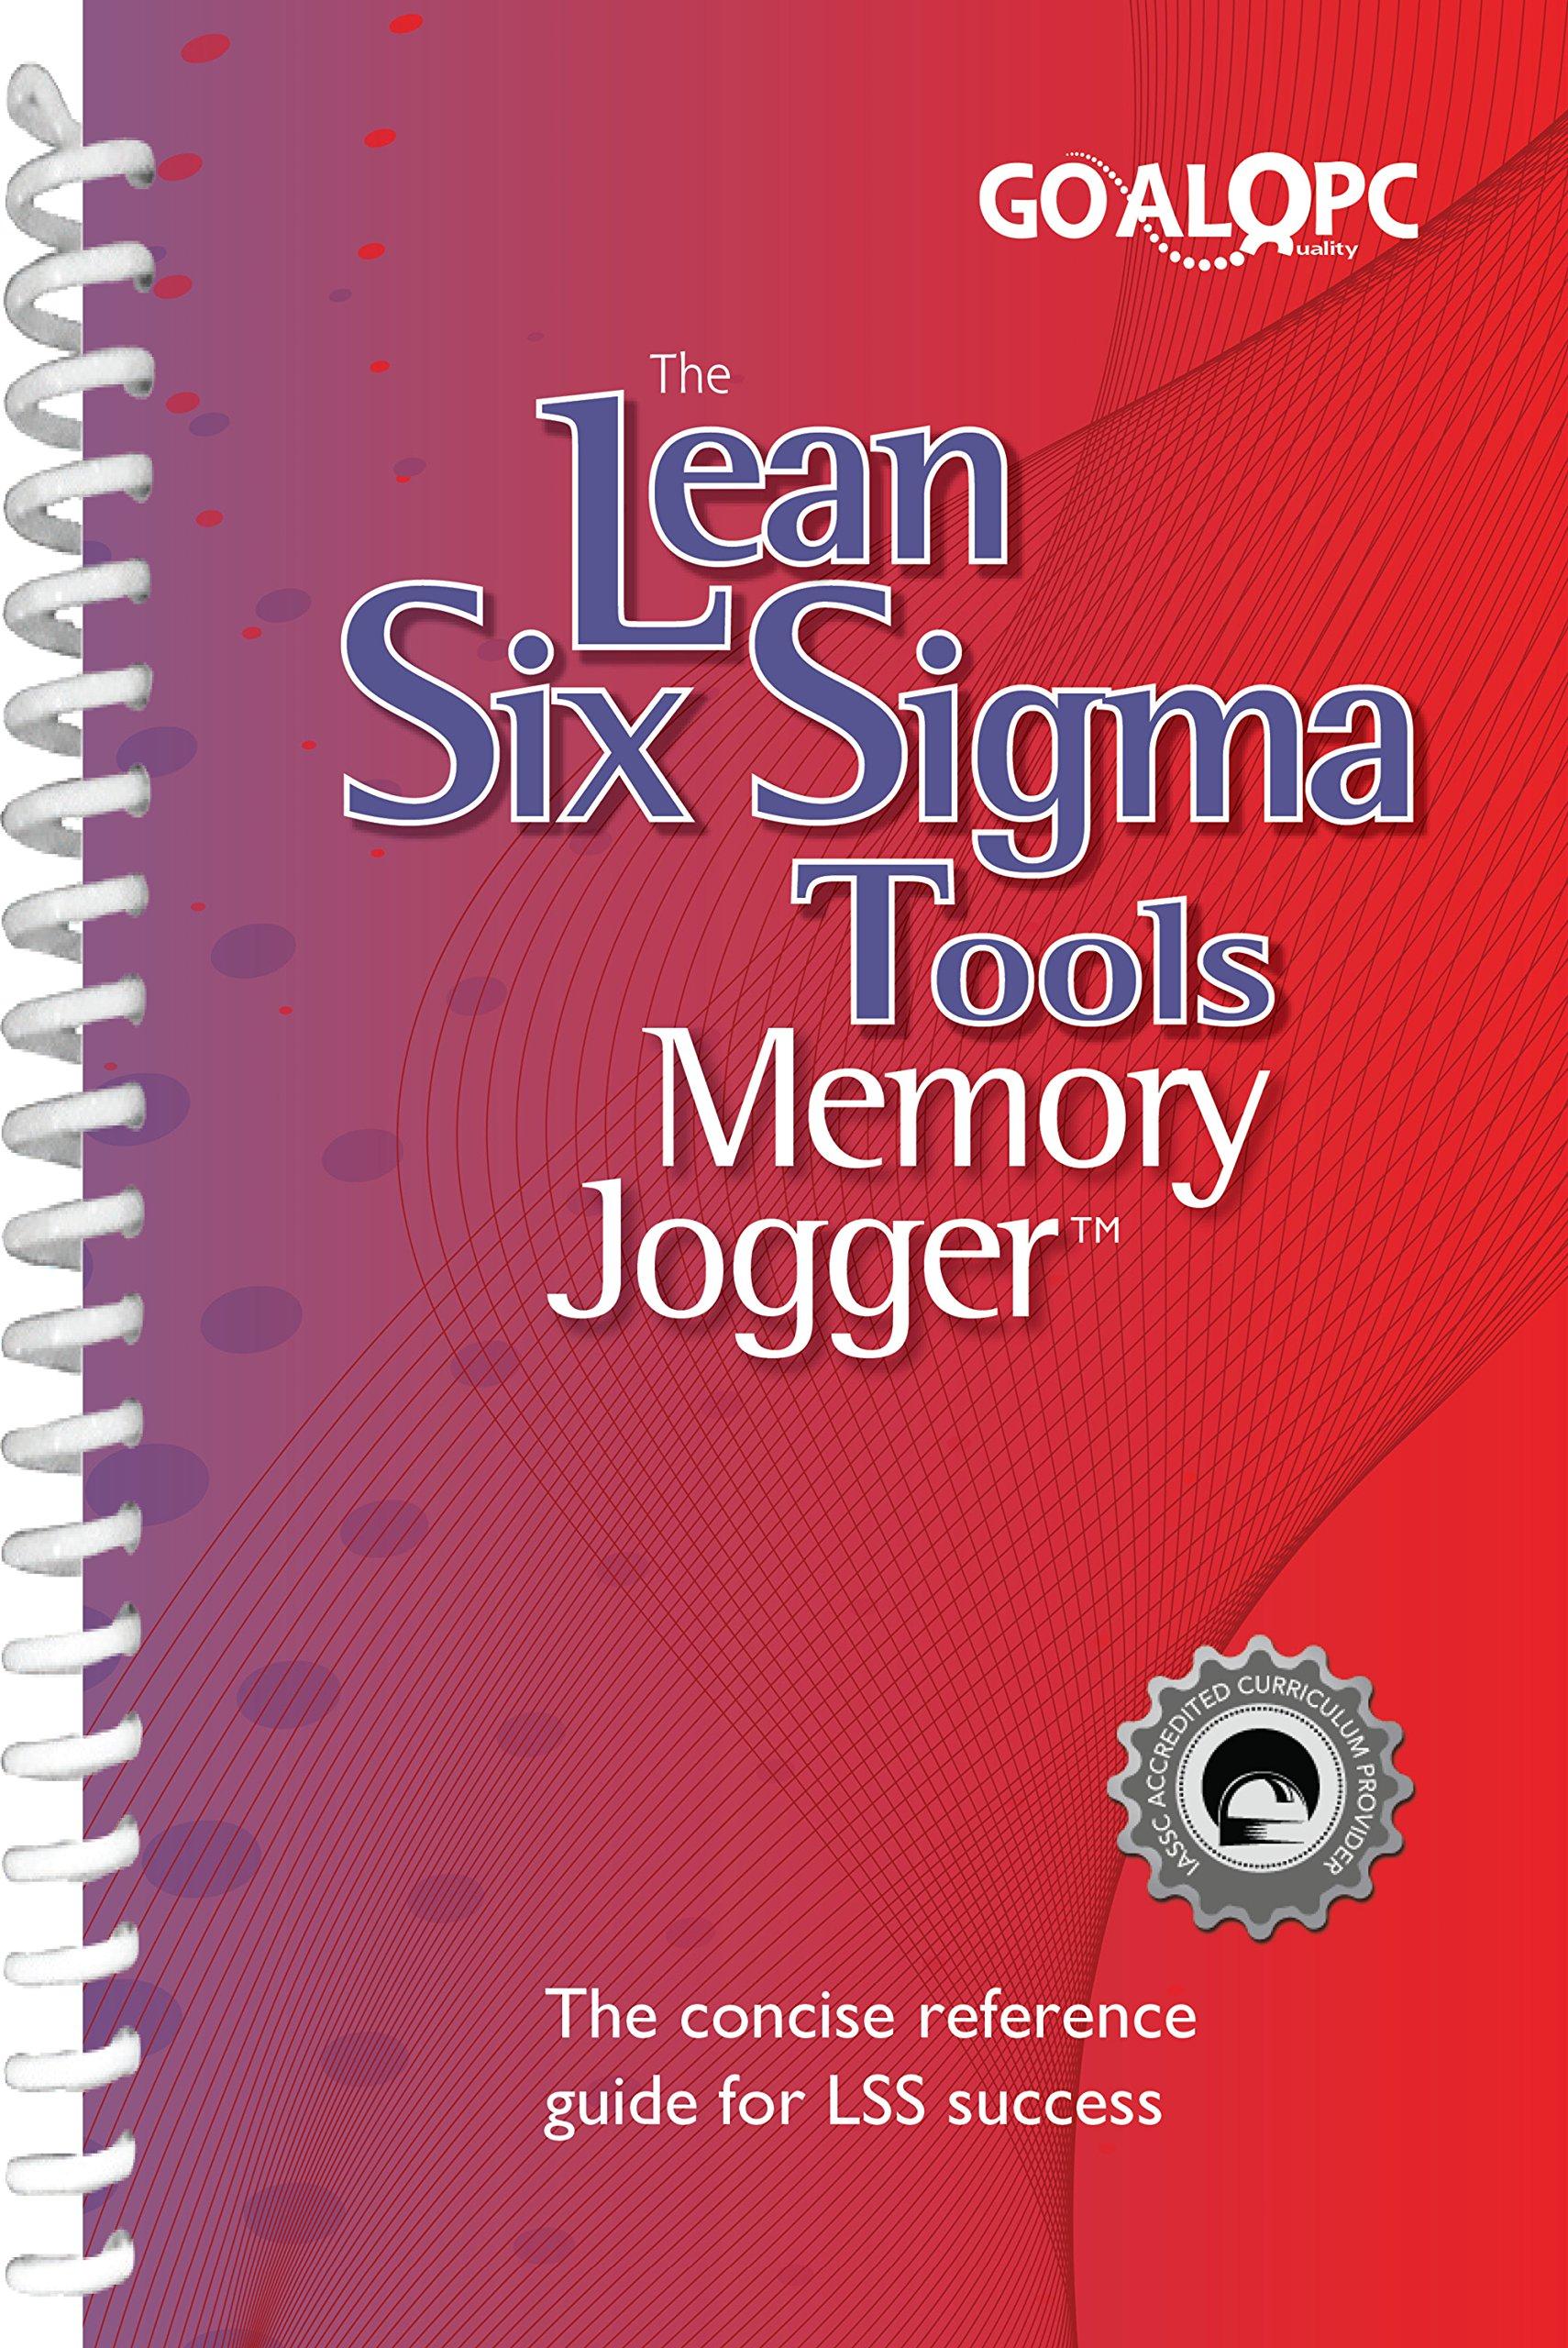 Lean Six Sigma Tools Memory Jogger Sarah Carleton Six Sigma